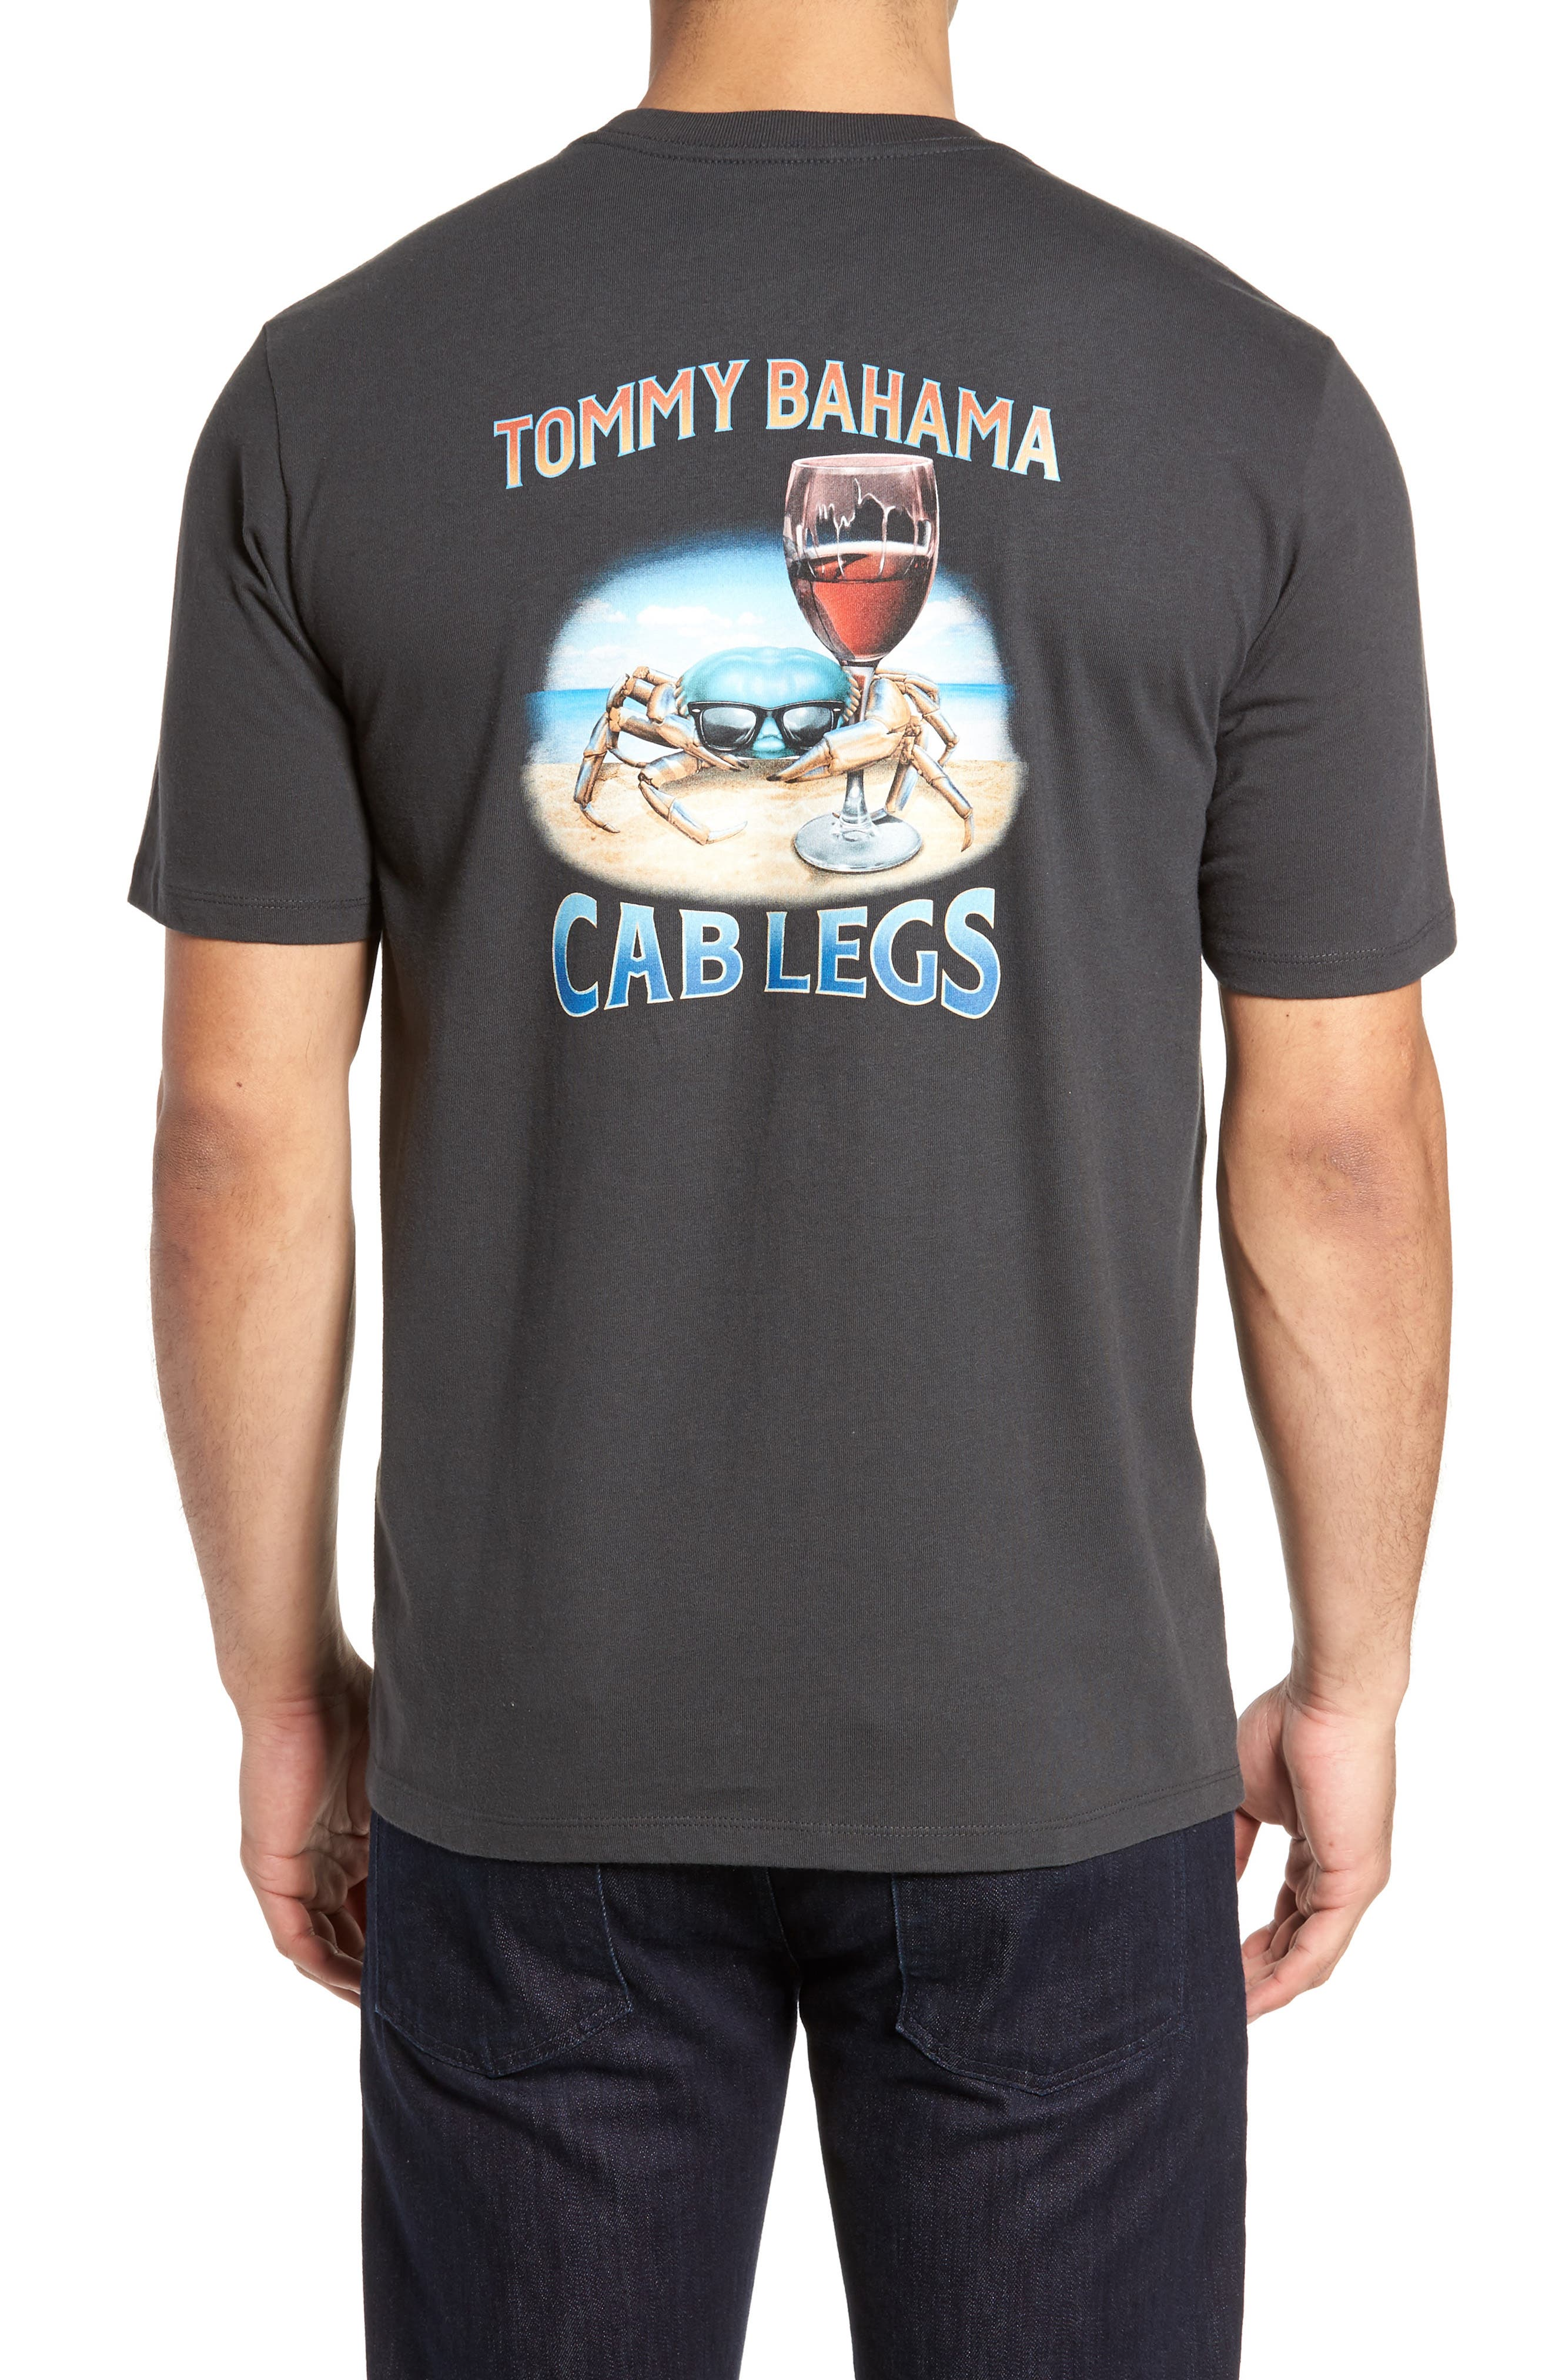 Cab Legs Graphic T-Shirt,                             Alternate thumbnail 2, color,